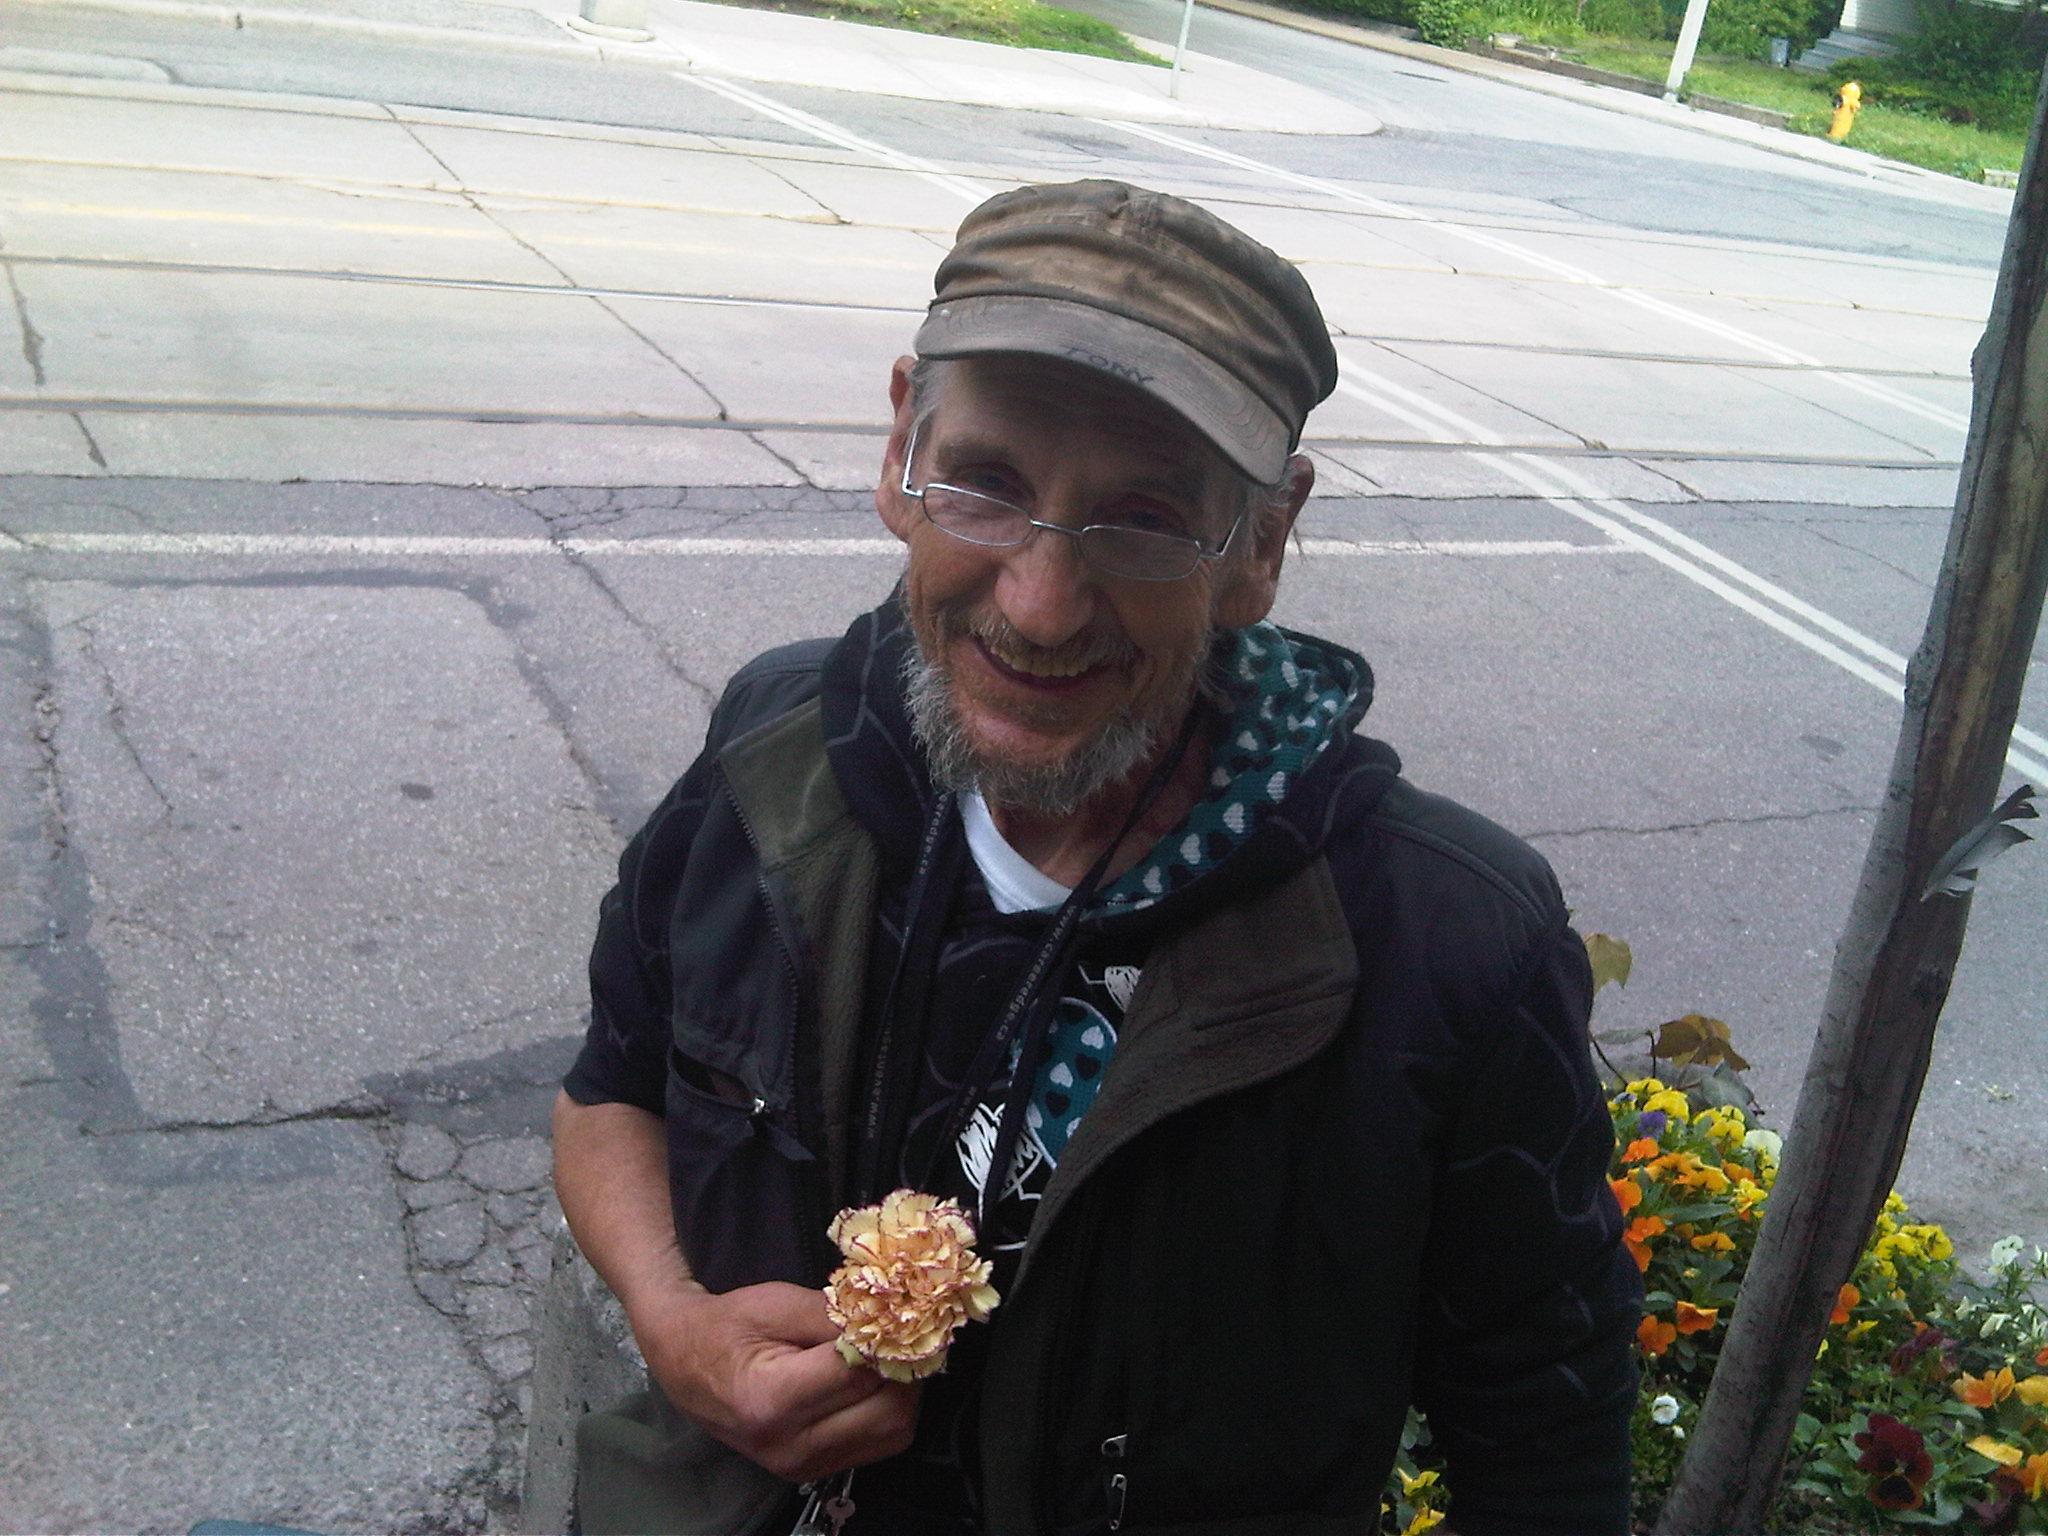 Tony with carnation - June 23 2009